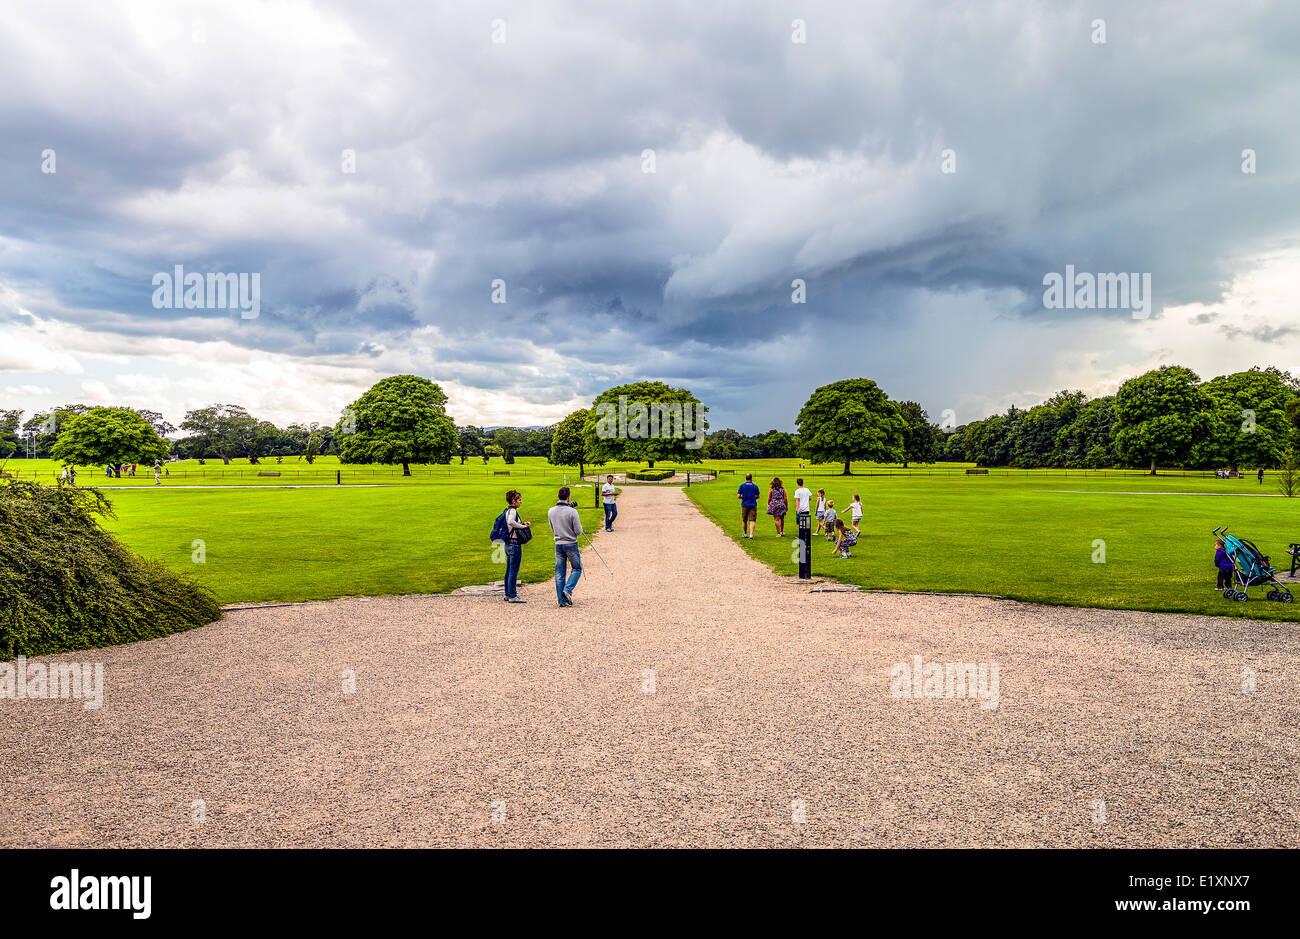 Ireland, Dublin county, visitors in the Malahide garden - Stock Image